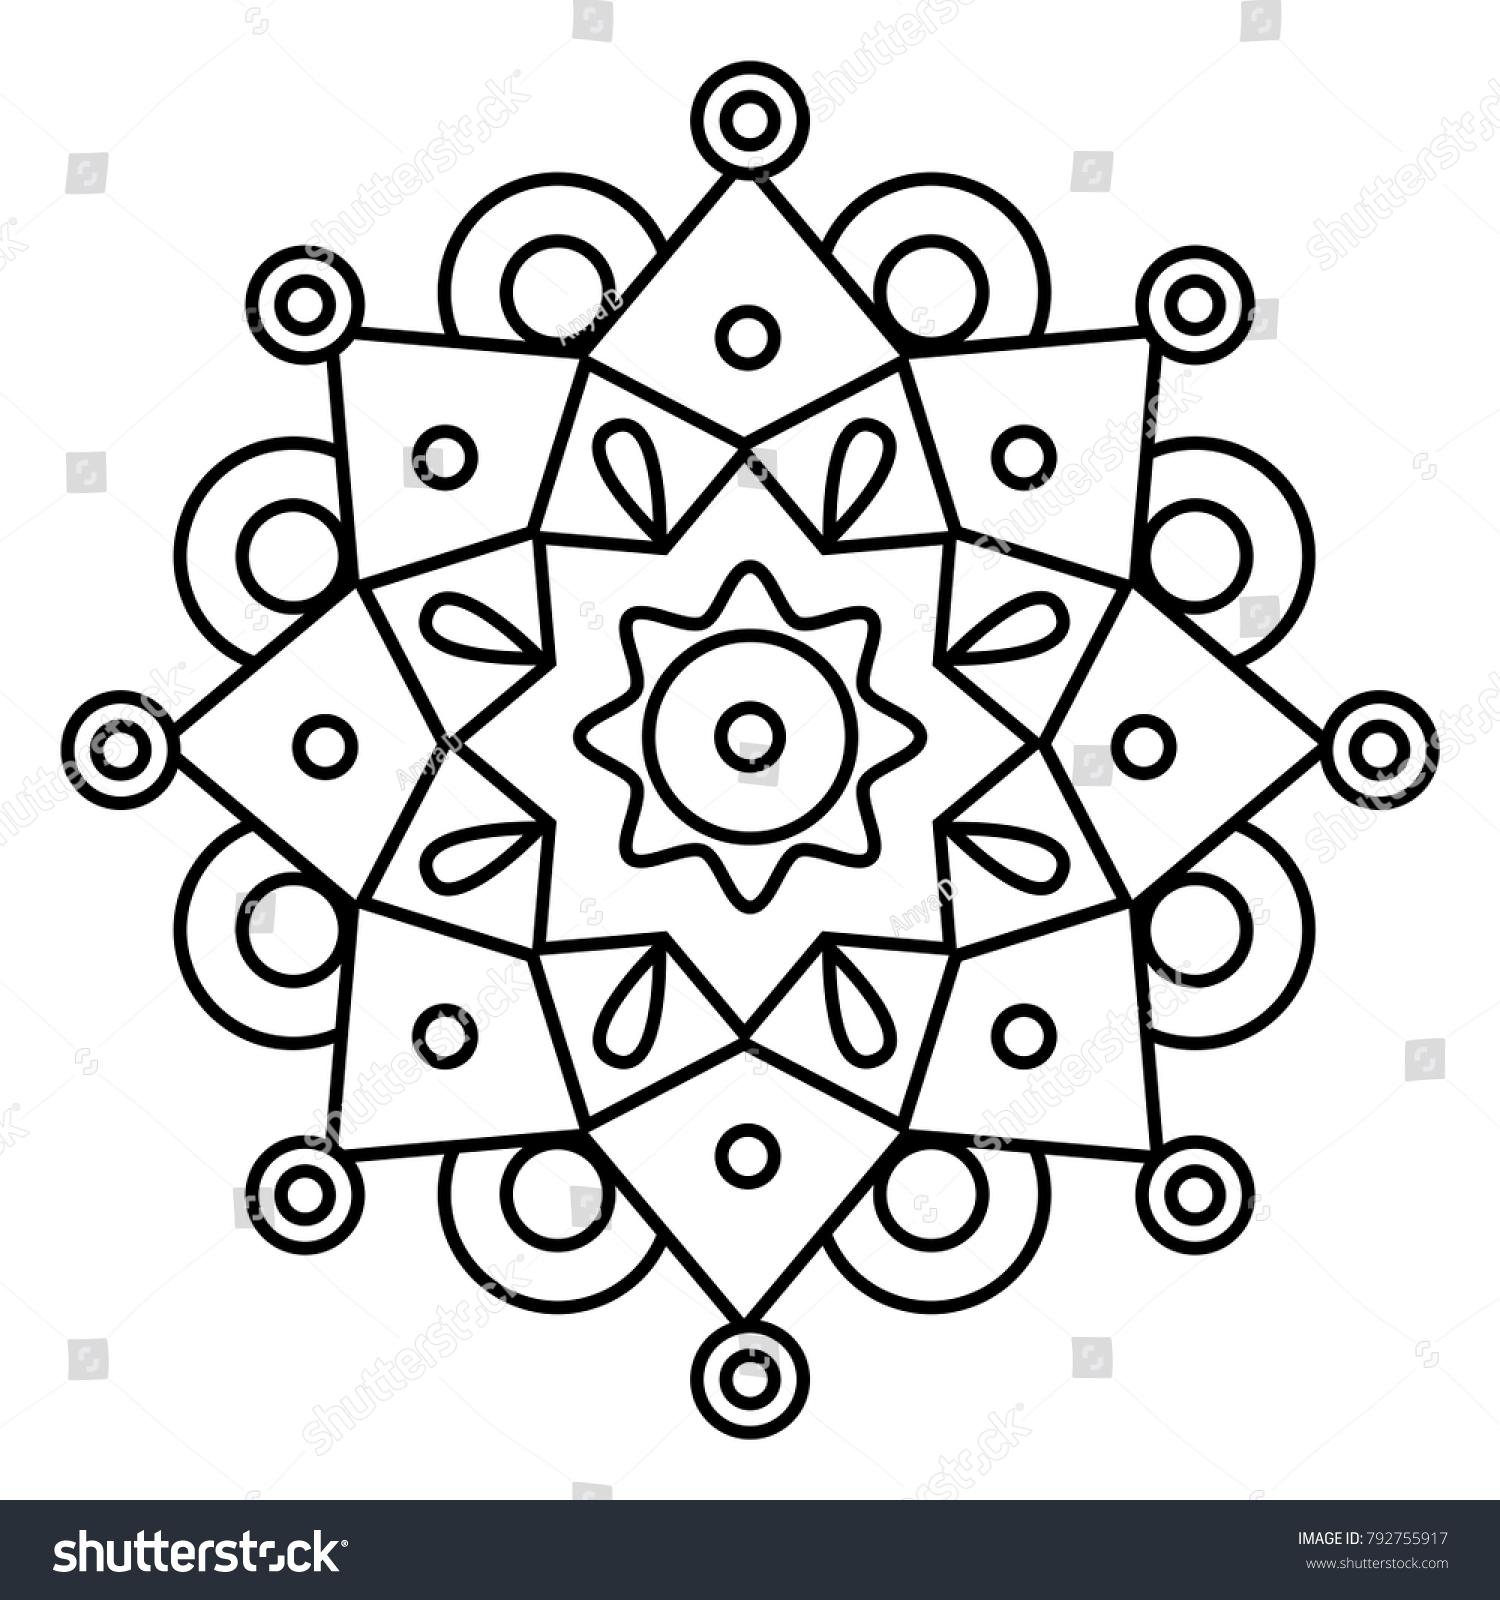 Simple Floral Mandala Print Easy Coloring Stock Vector (Royalty Free ...